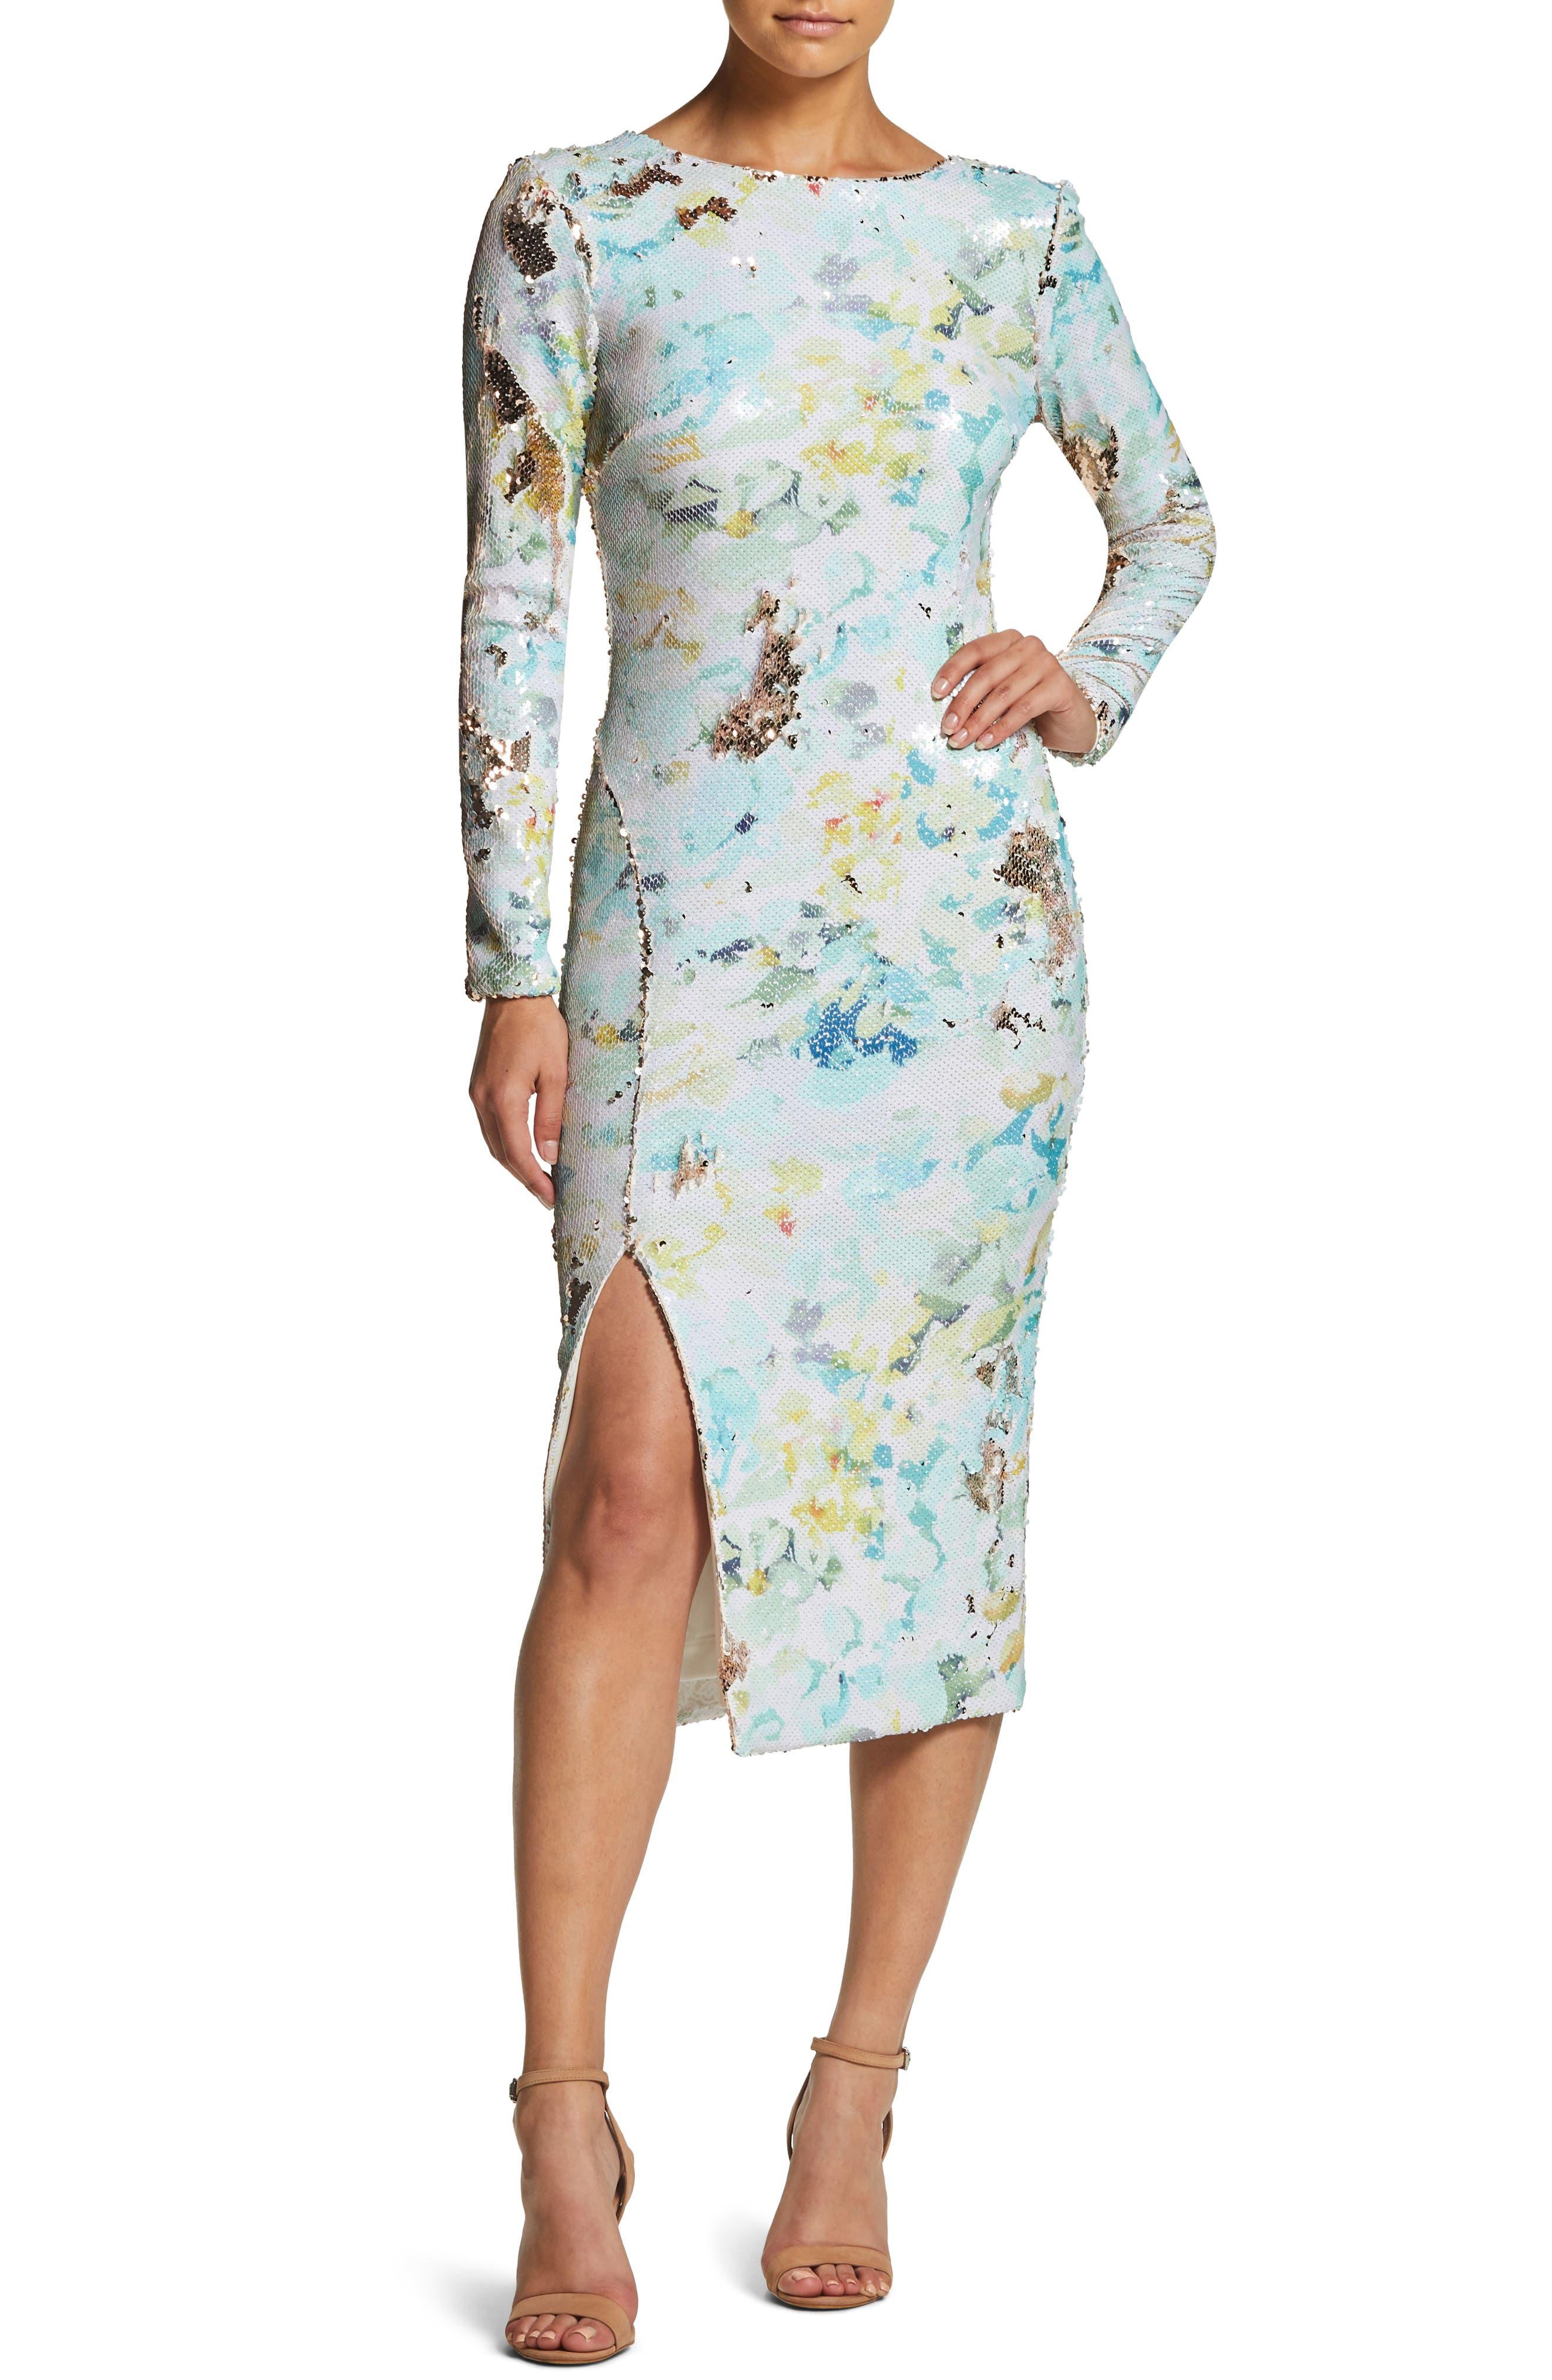 DRESS THE POPULATION, Natalie Scoop Back Sequin Dress, Main thumbnail 1, color, IVORY/ SAGE/ GOLD